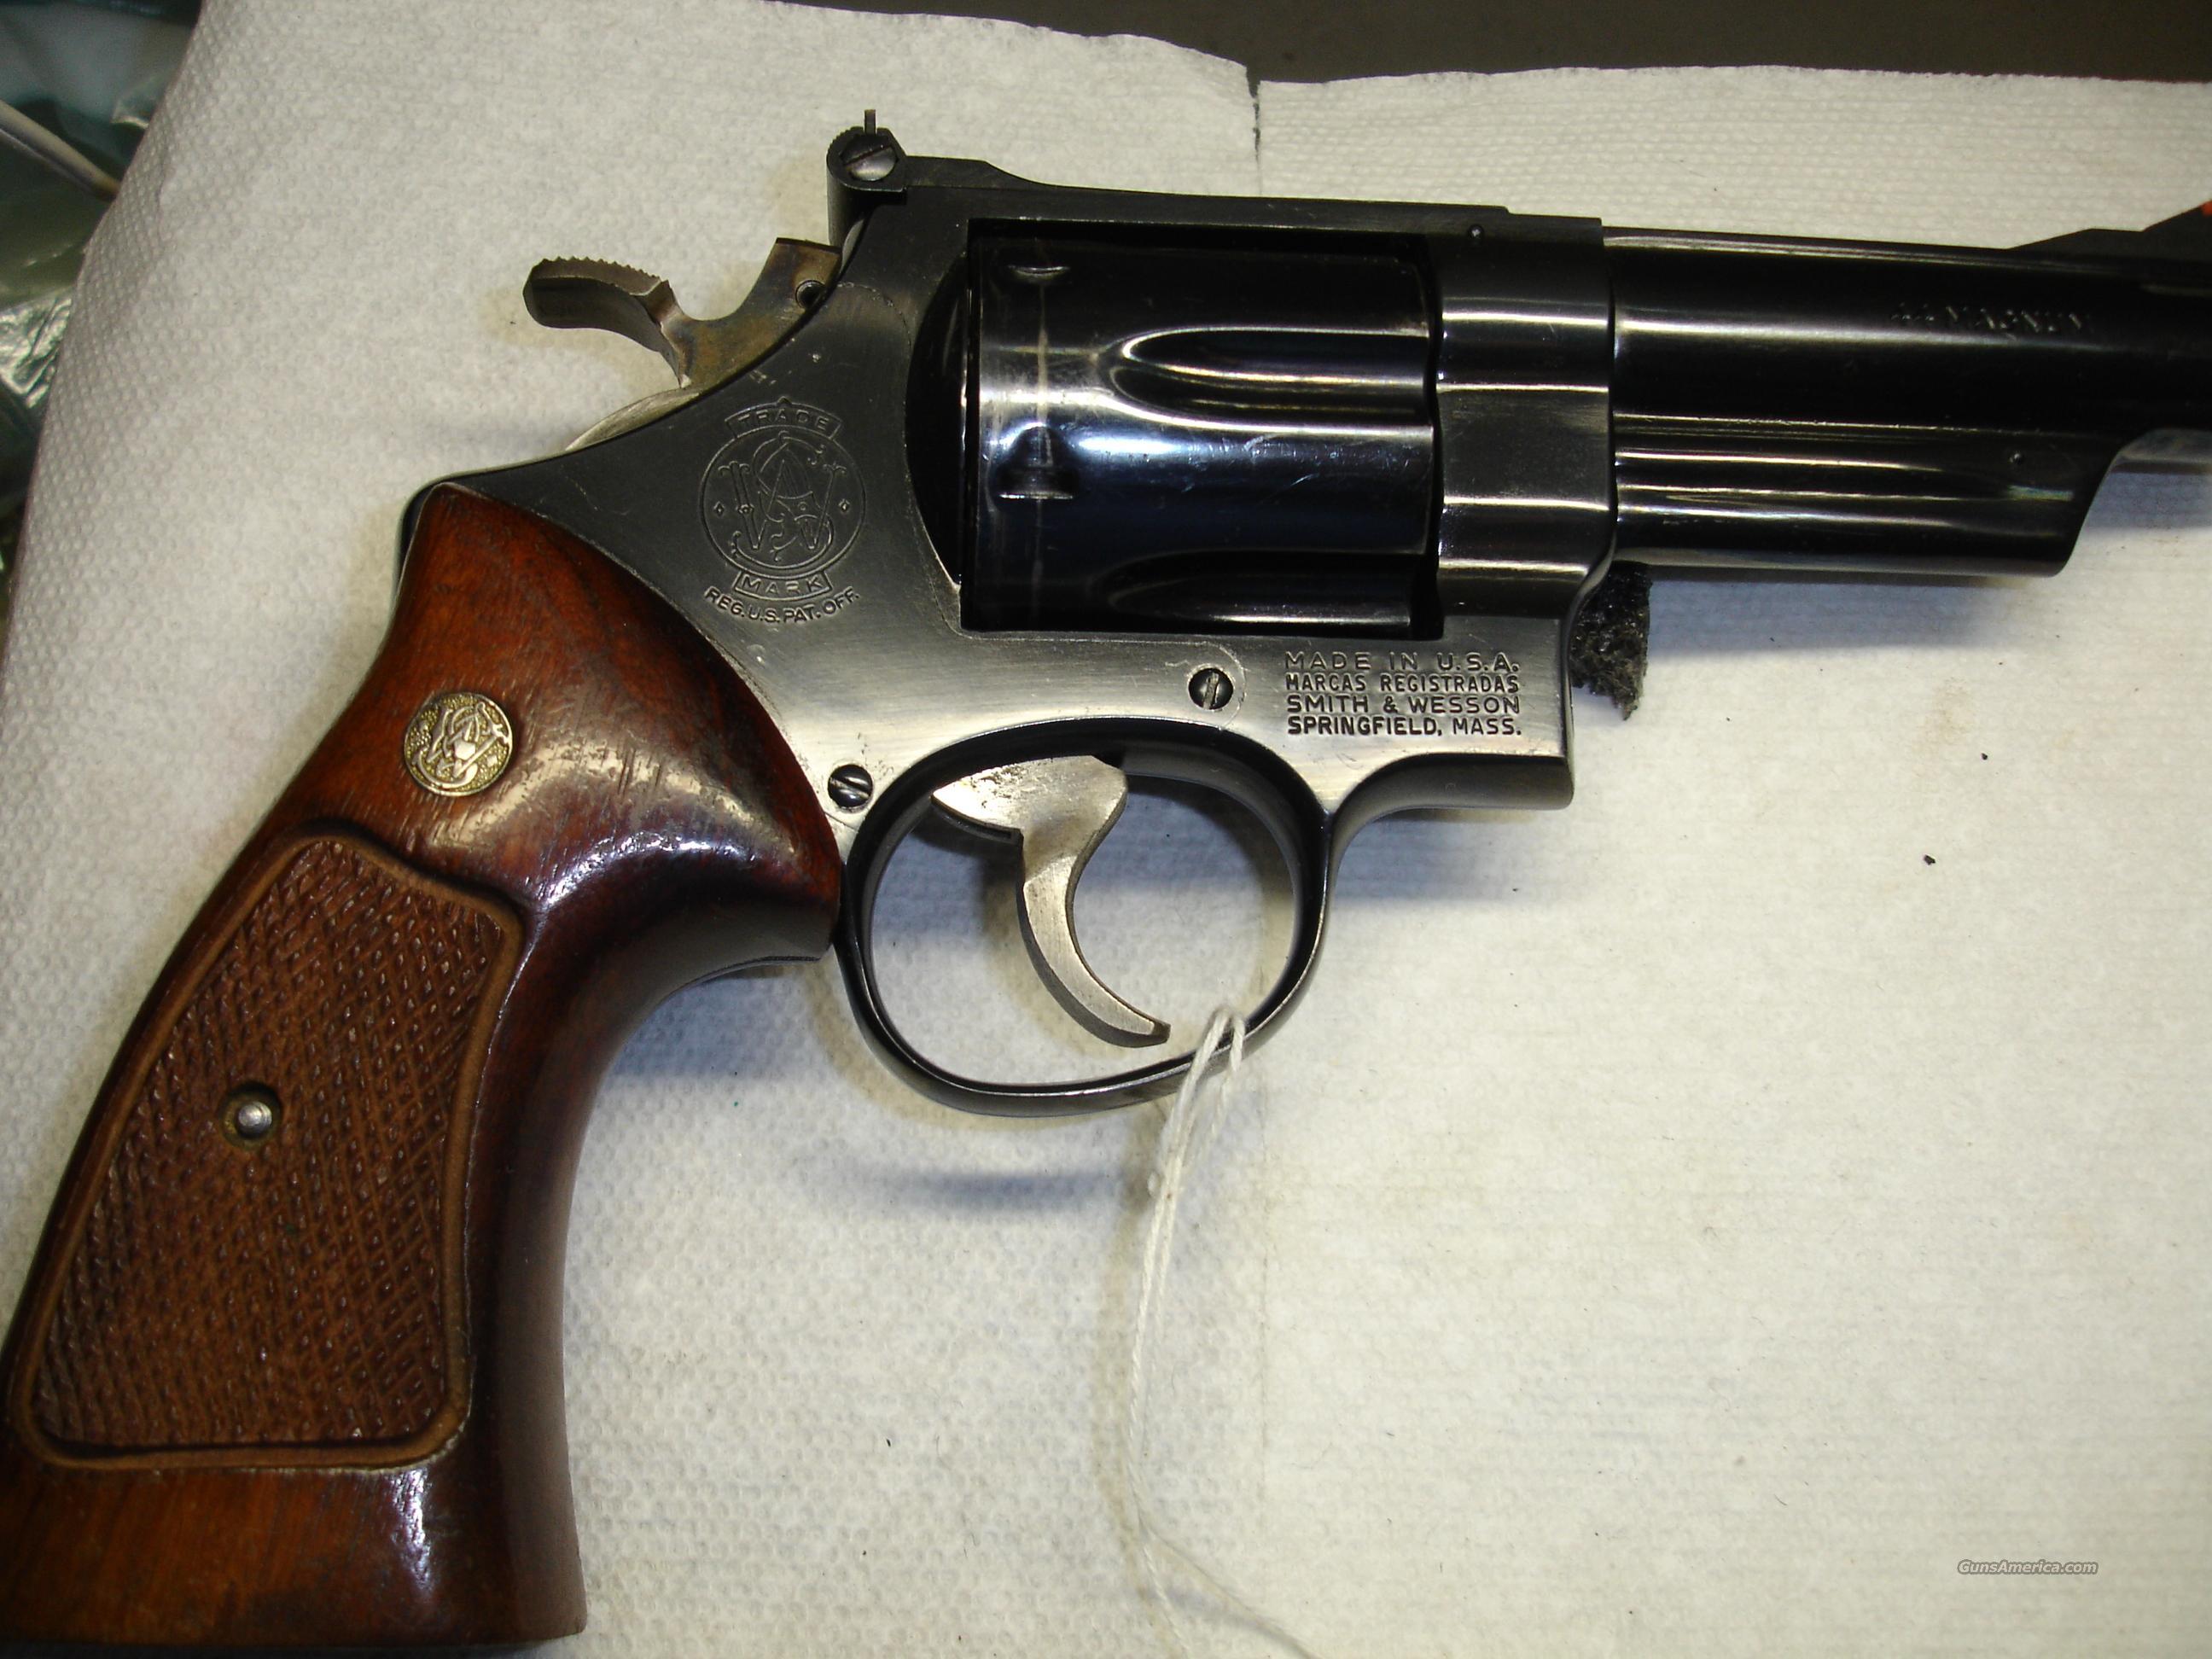 S&W MODEL 29-2  Guns > Pistols > Smith & Wesson Revolvers > Full Frame Revolver